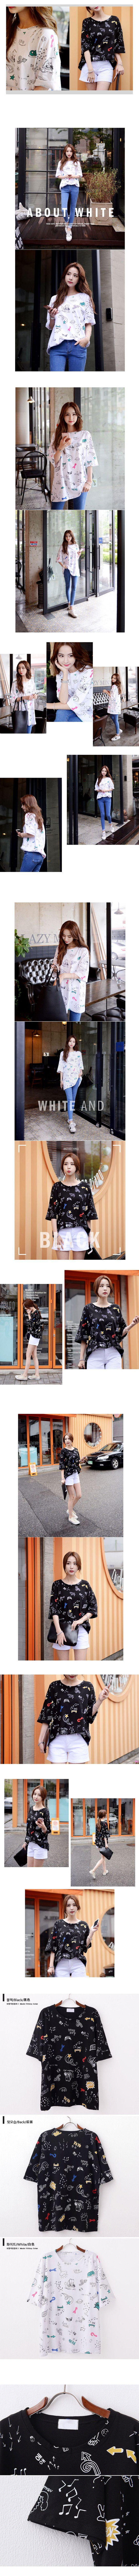 Korean Fashion Online Store 韓流 Trends Luxe Asian Women 韓国 Style Shop korean clothing The webtoon Top